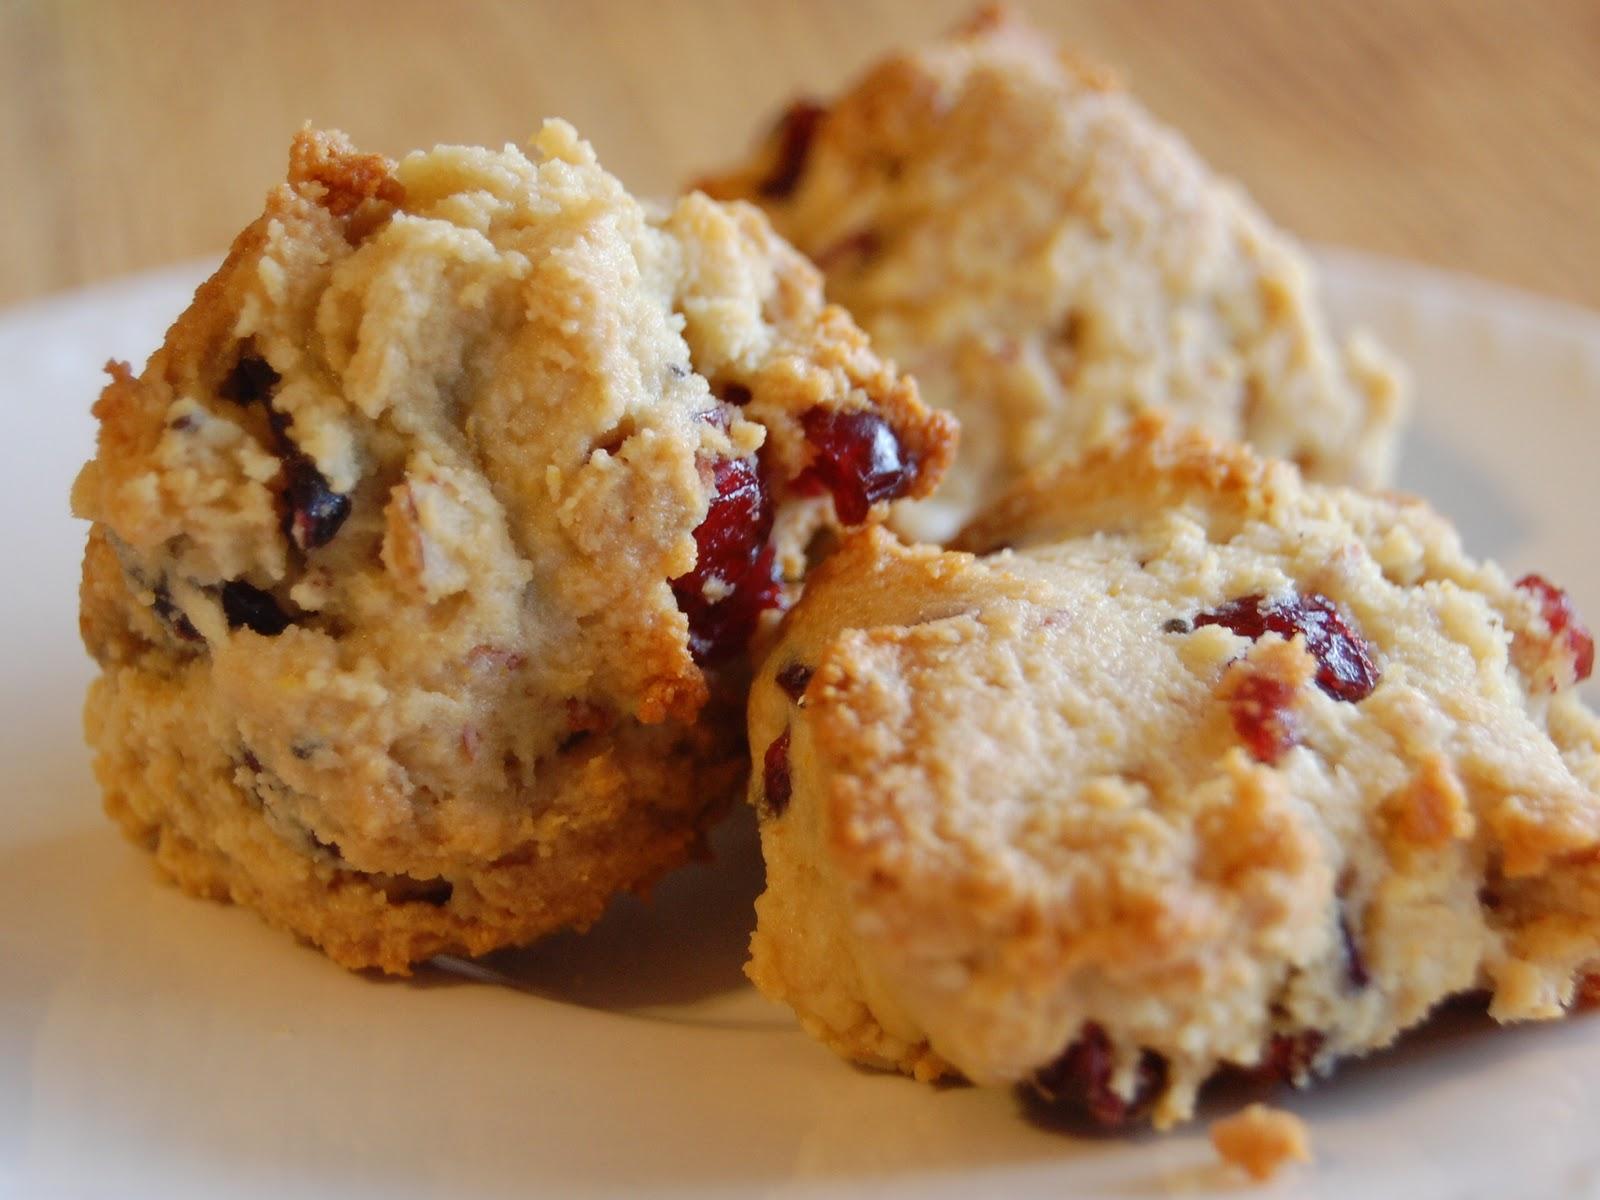 The Nourishing Homemaker: Cranberry Orange Scones Recipe